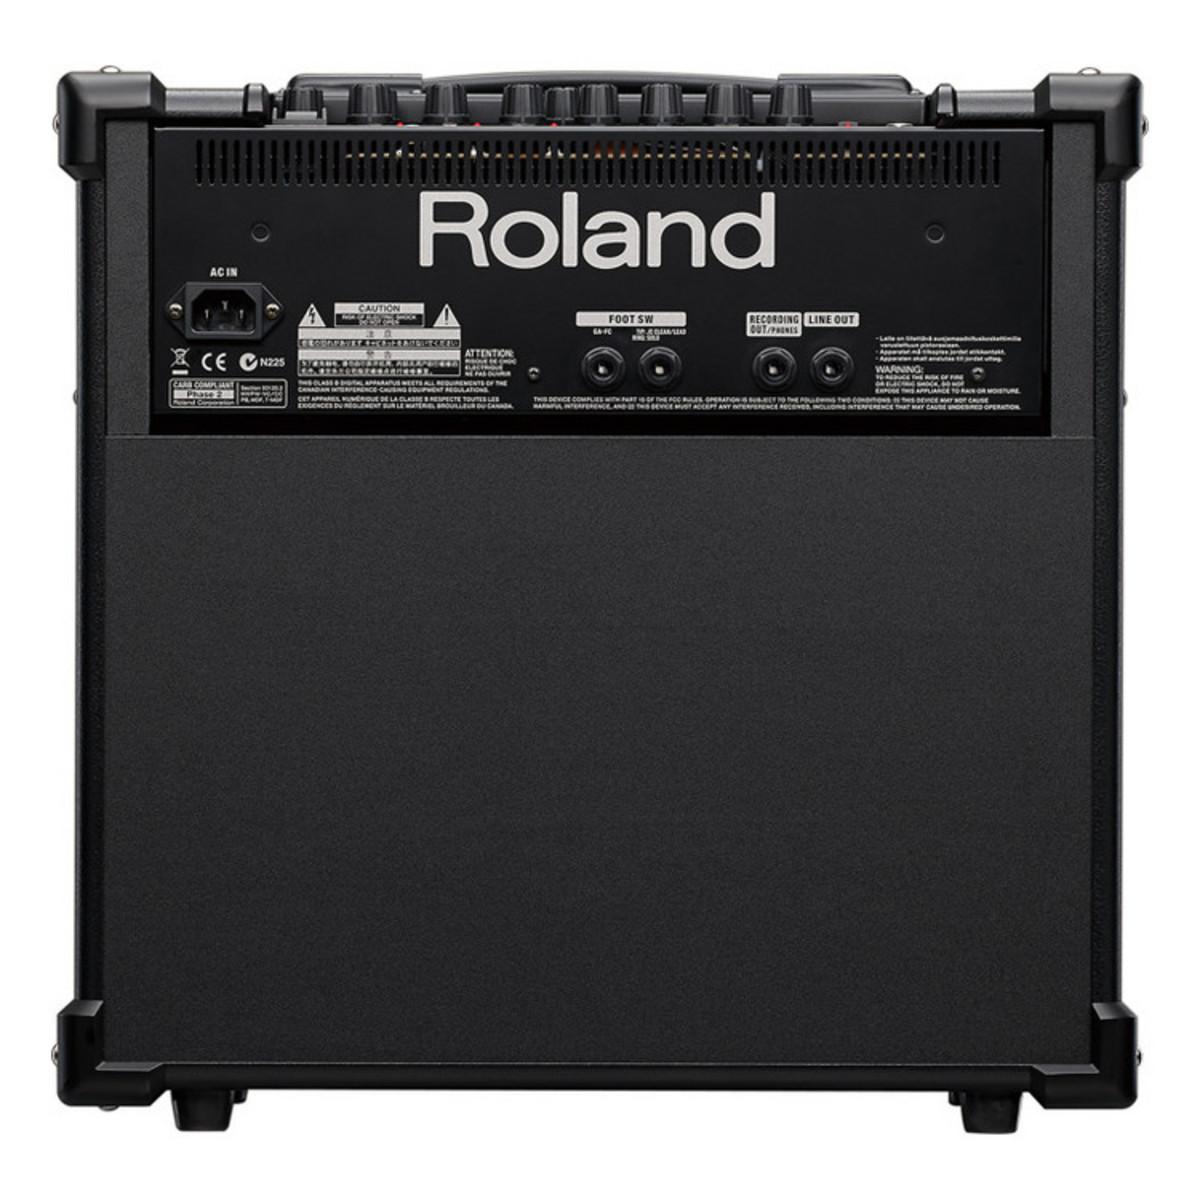 disc roland cube 80gx guitar amplifier at. Black Bedroom Furniture Sets. Home Design Ideas